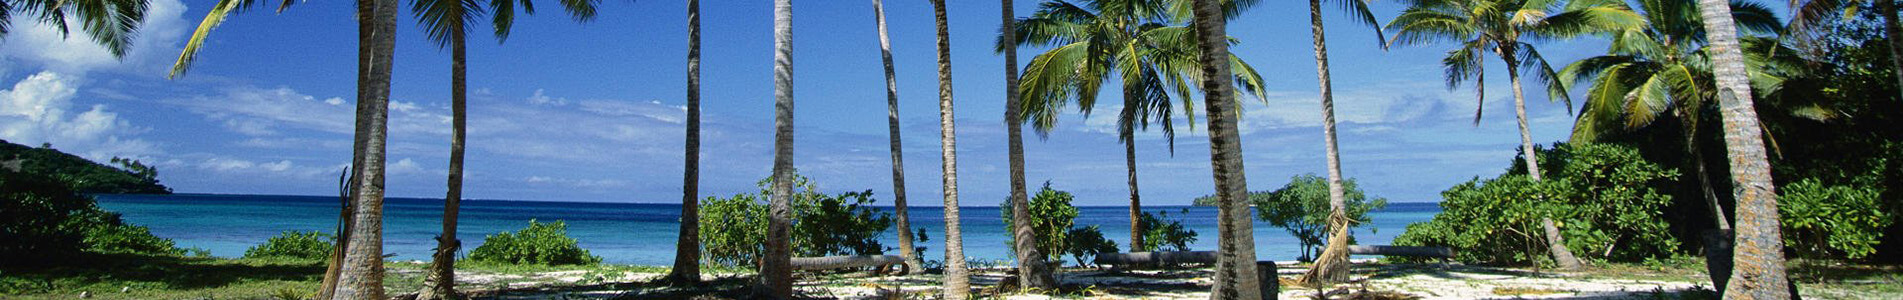 Charter di Superyacht Pacifico